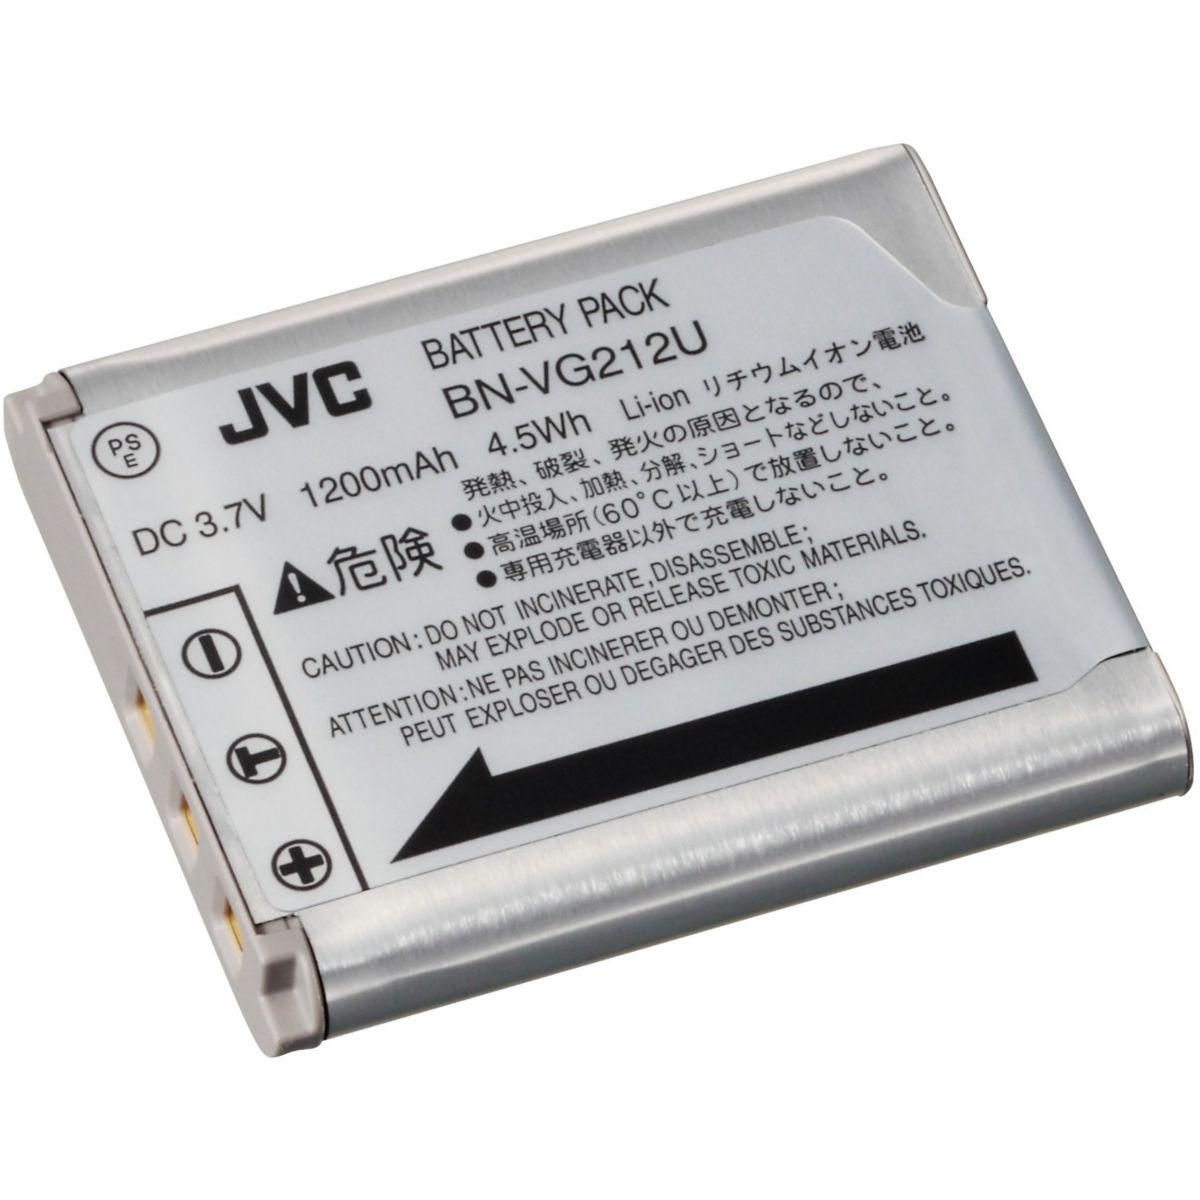 Batterie jvc bn-vg212eu - livraison offerte : code liv (photo)